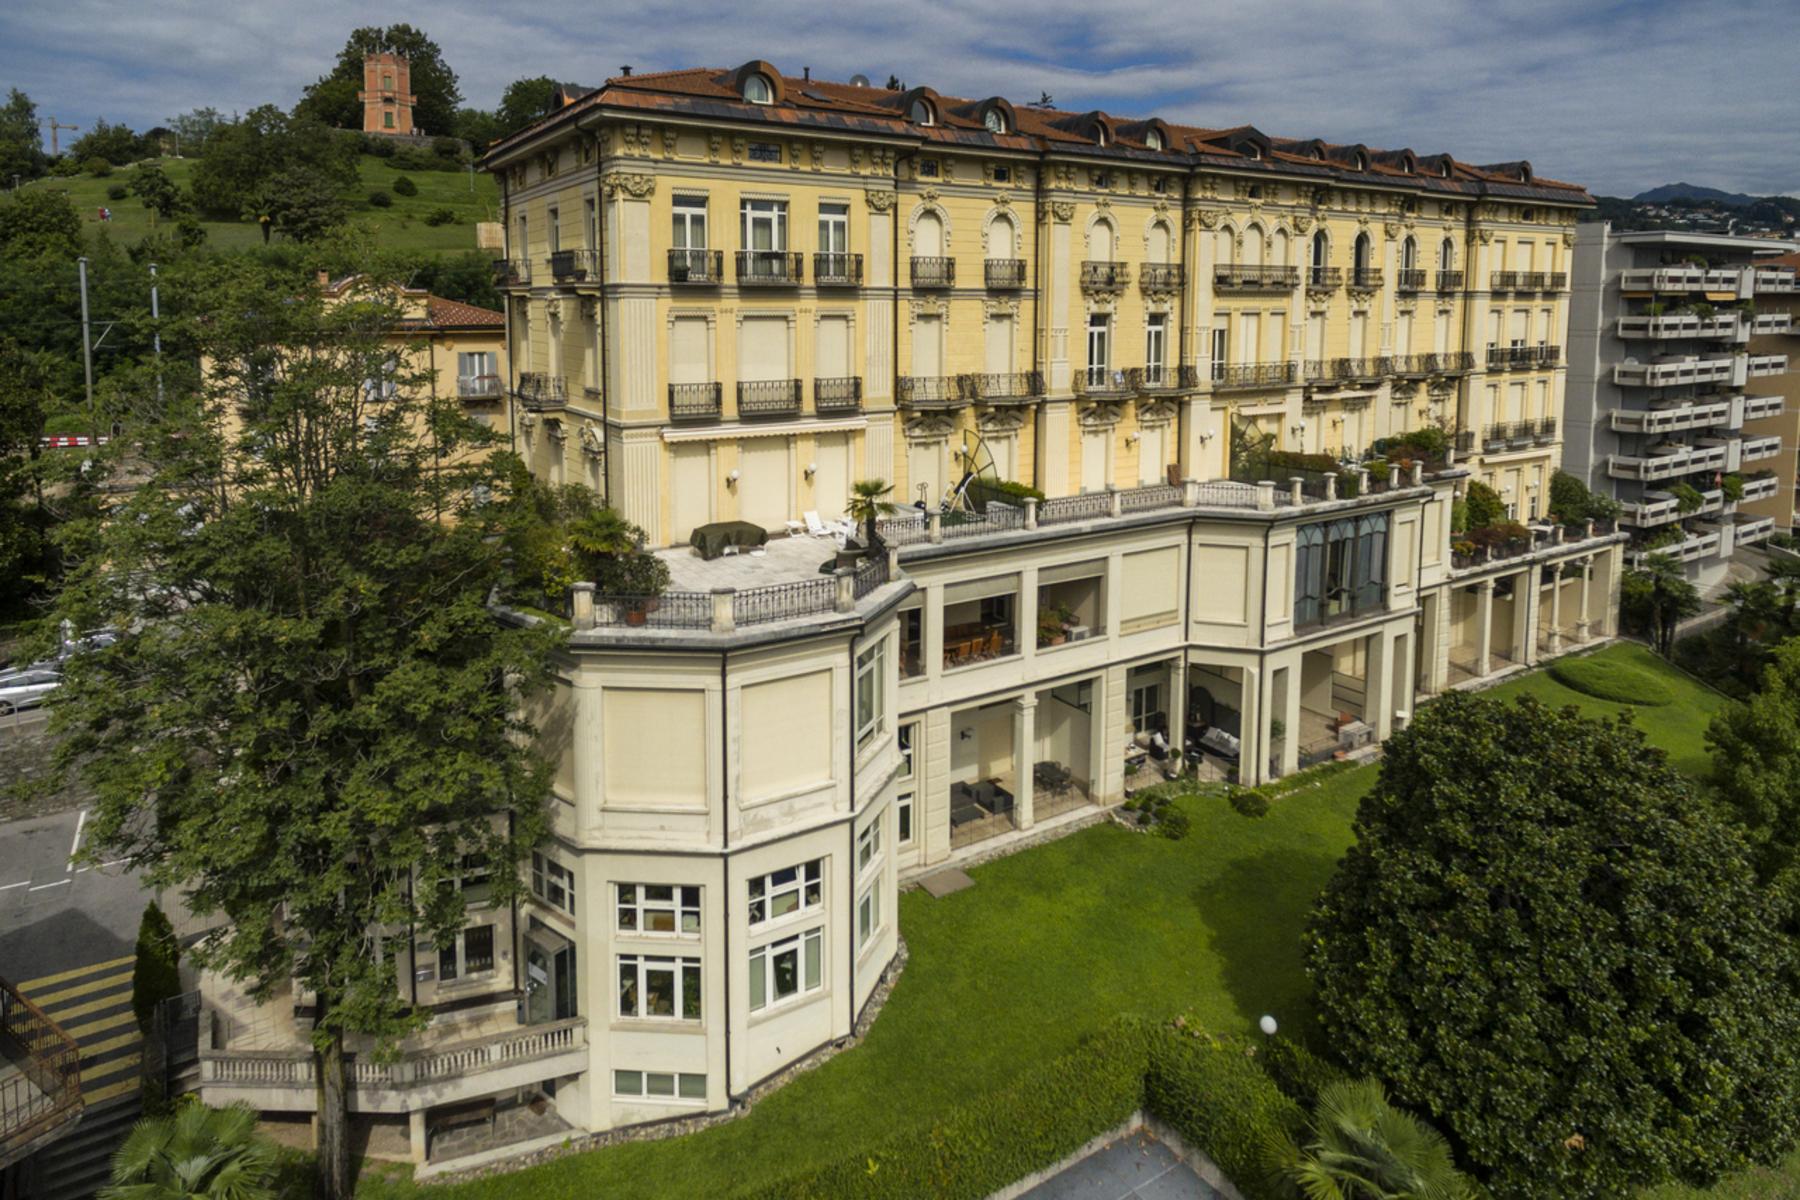 Appartement pour l à vendre à Duplex apartment in Residenza Bristol Lugano, Lugano, Ticino, 6900 Suisse